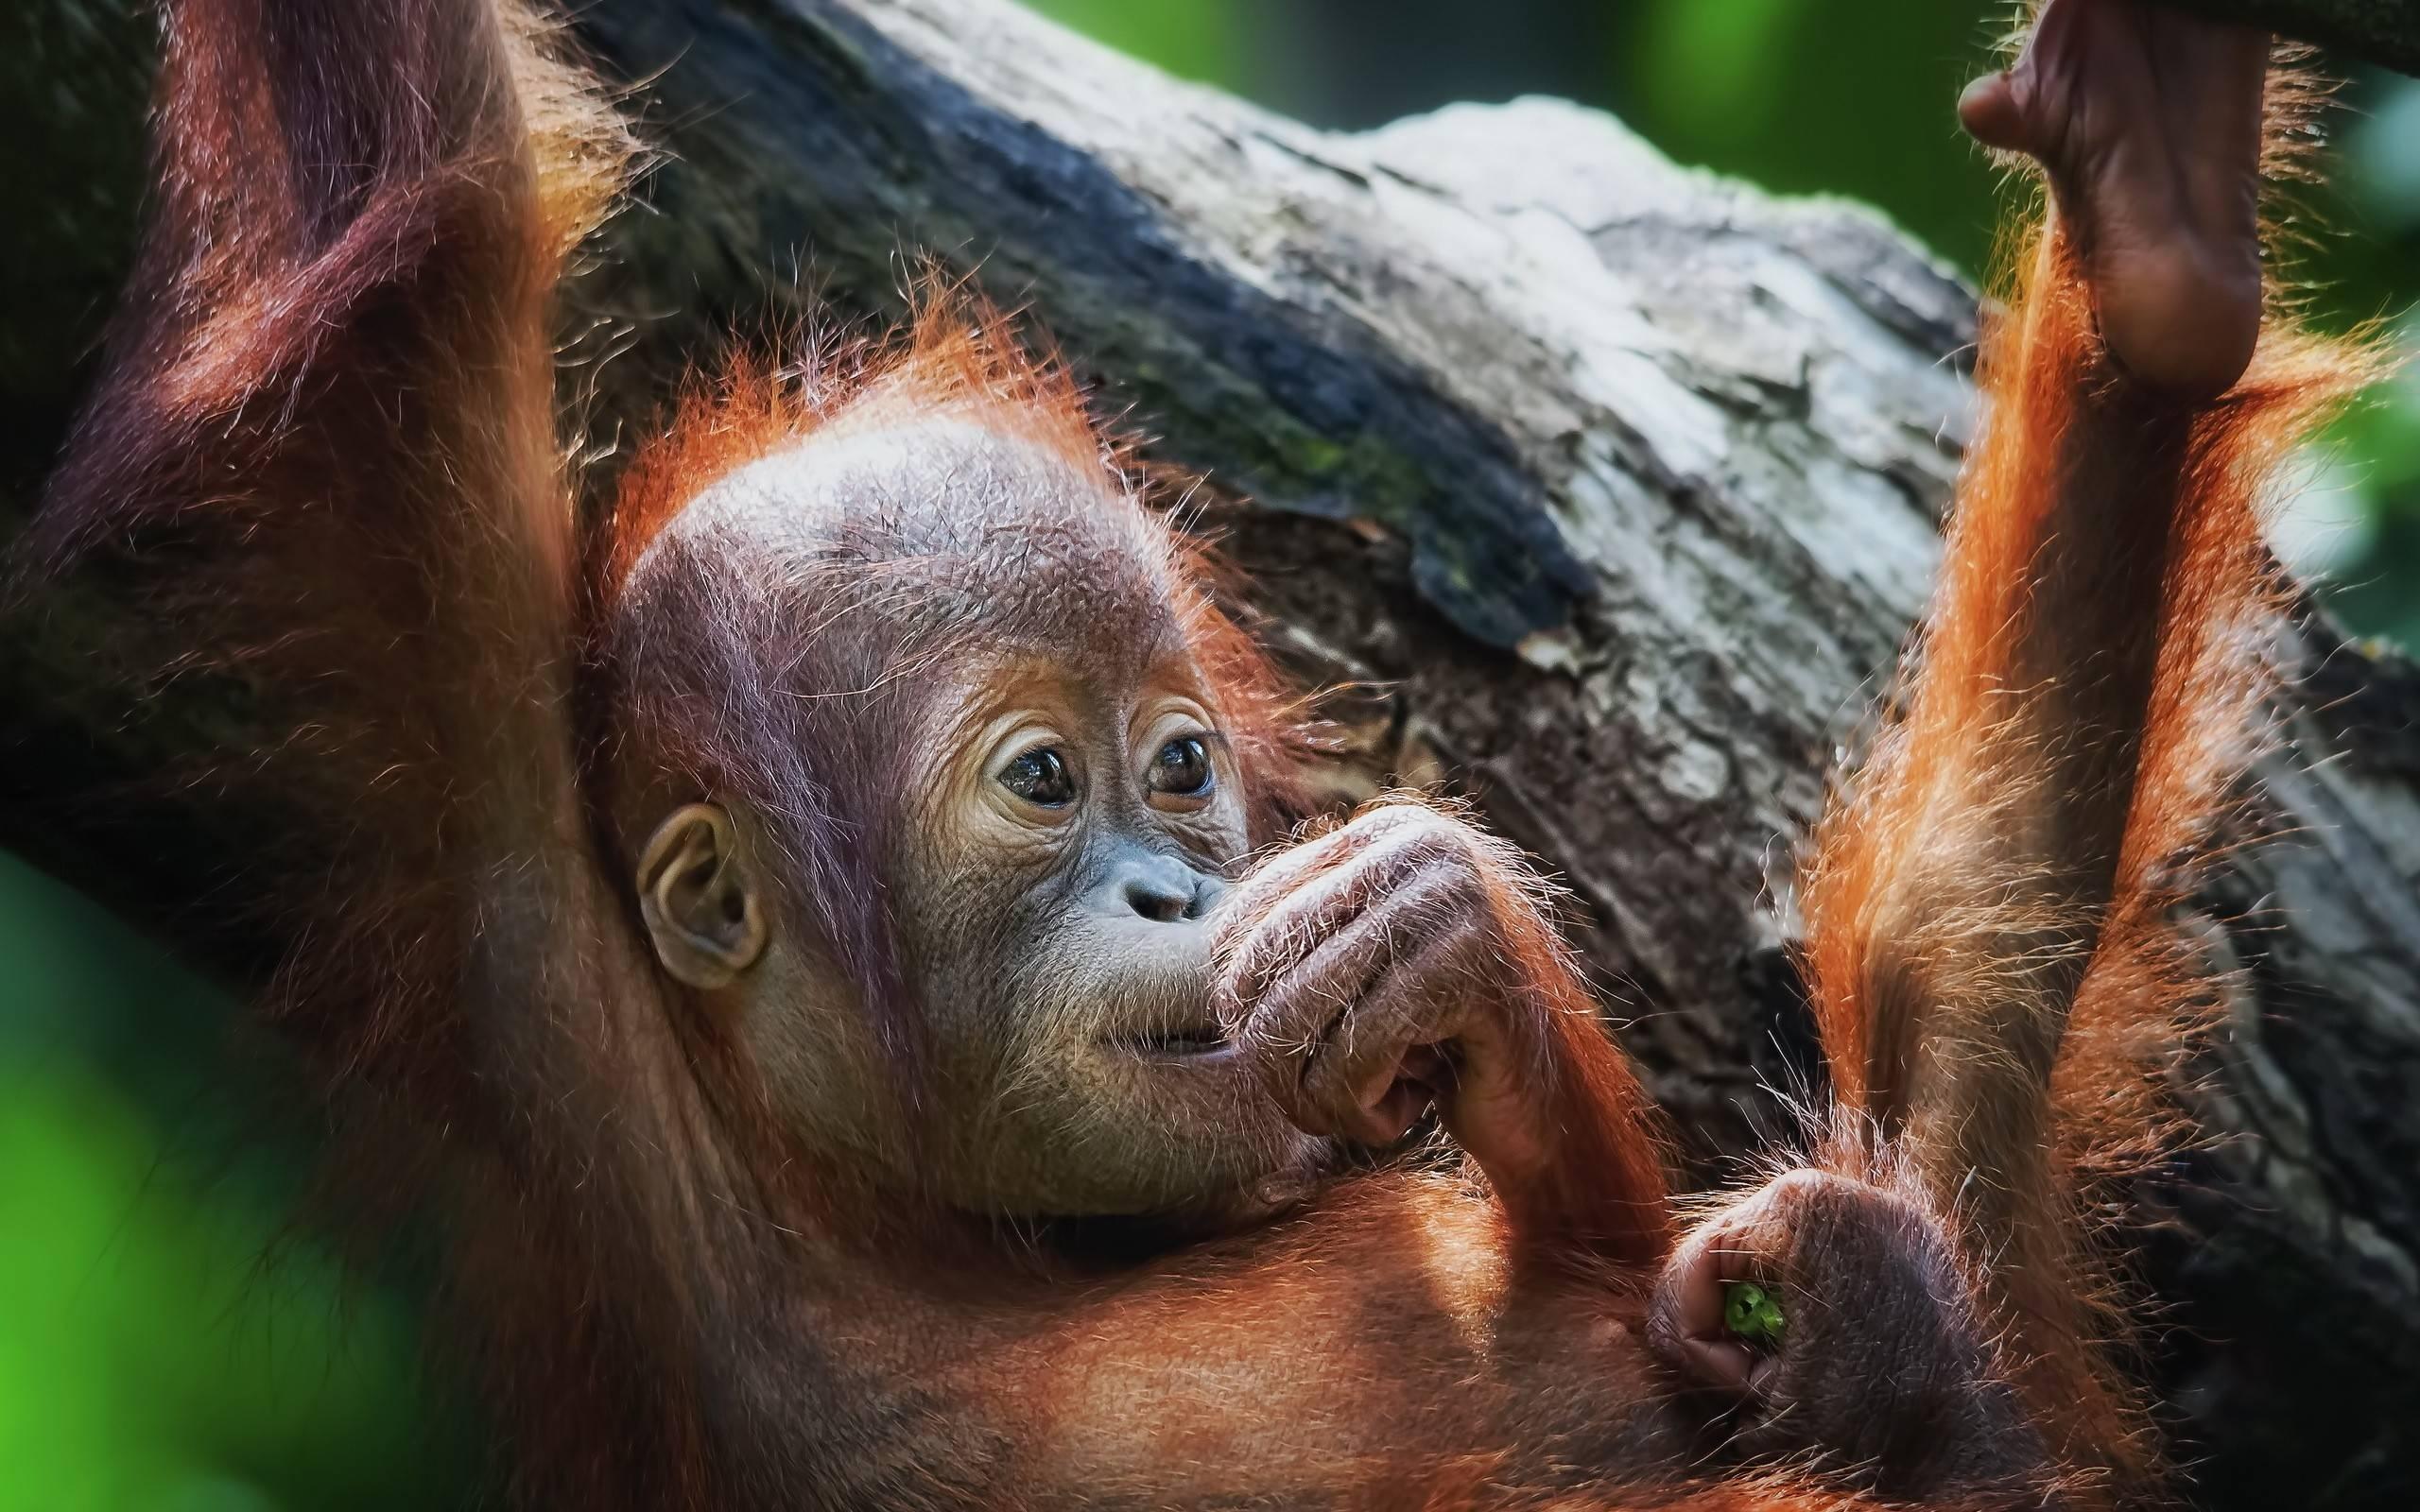 Orangutan Wallpapers - Wallpaper Cave